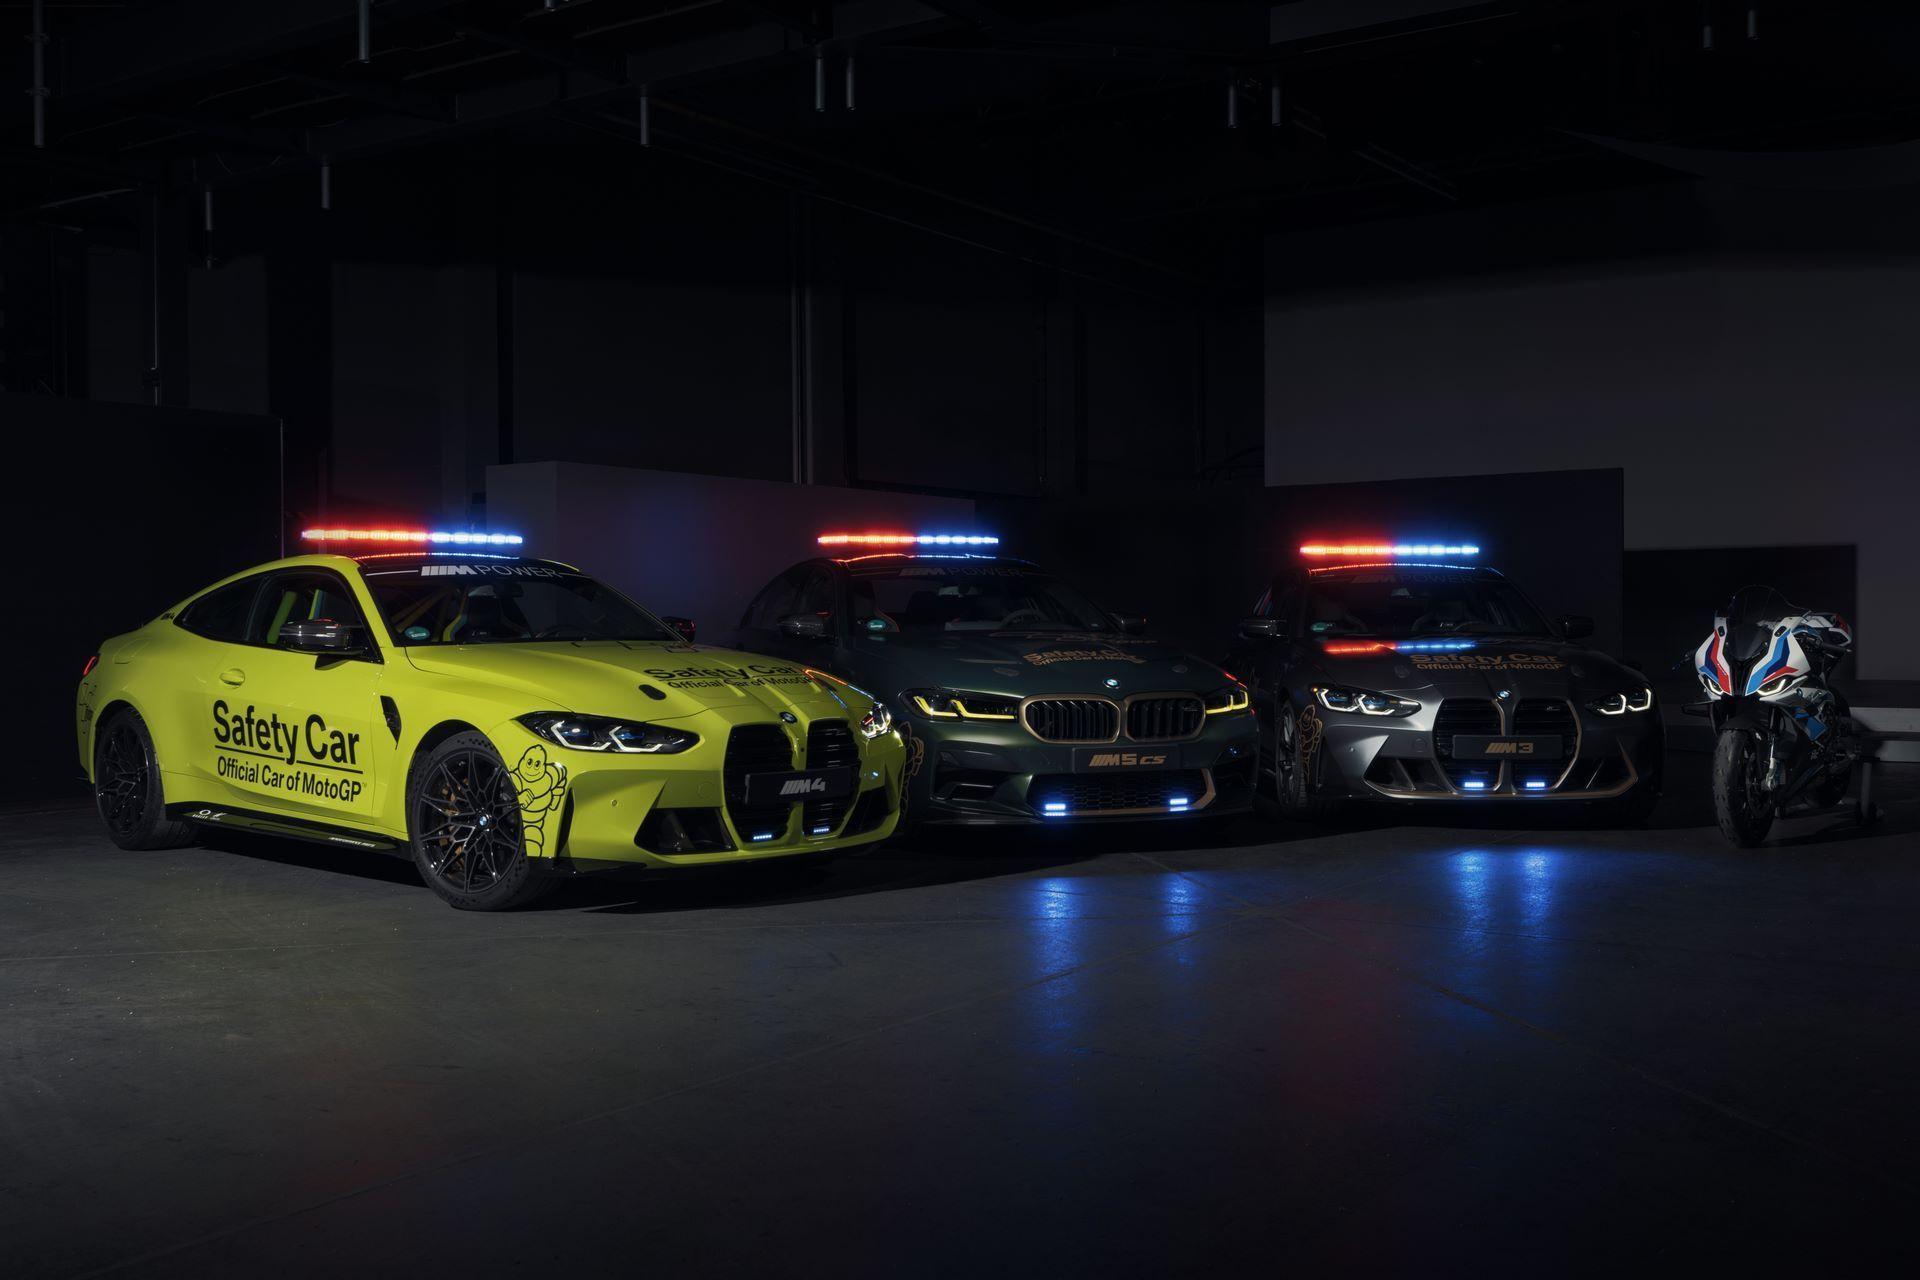 BMW-M3-M4-M5-CS-Safety-Cars-moto-gp-motogp-1